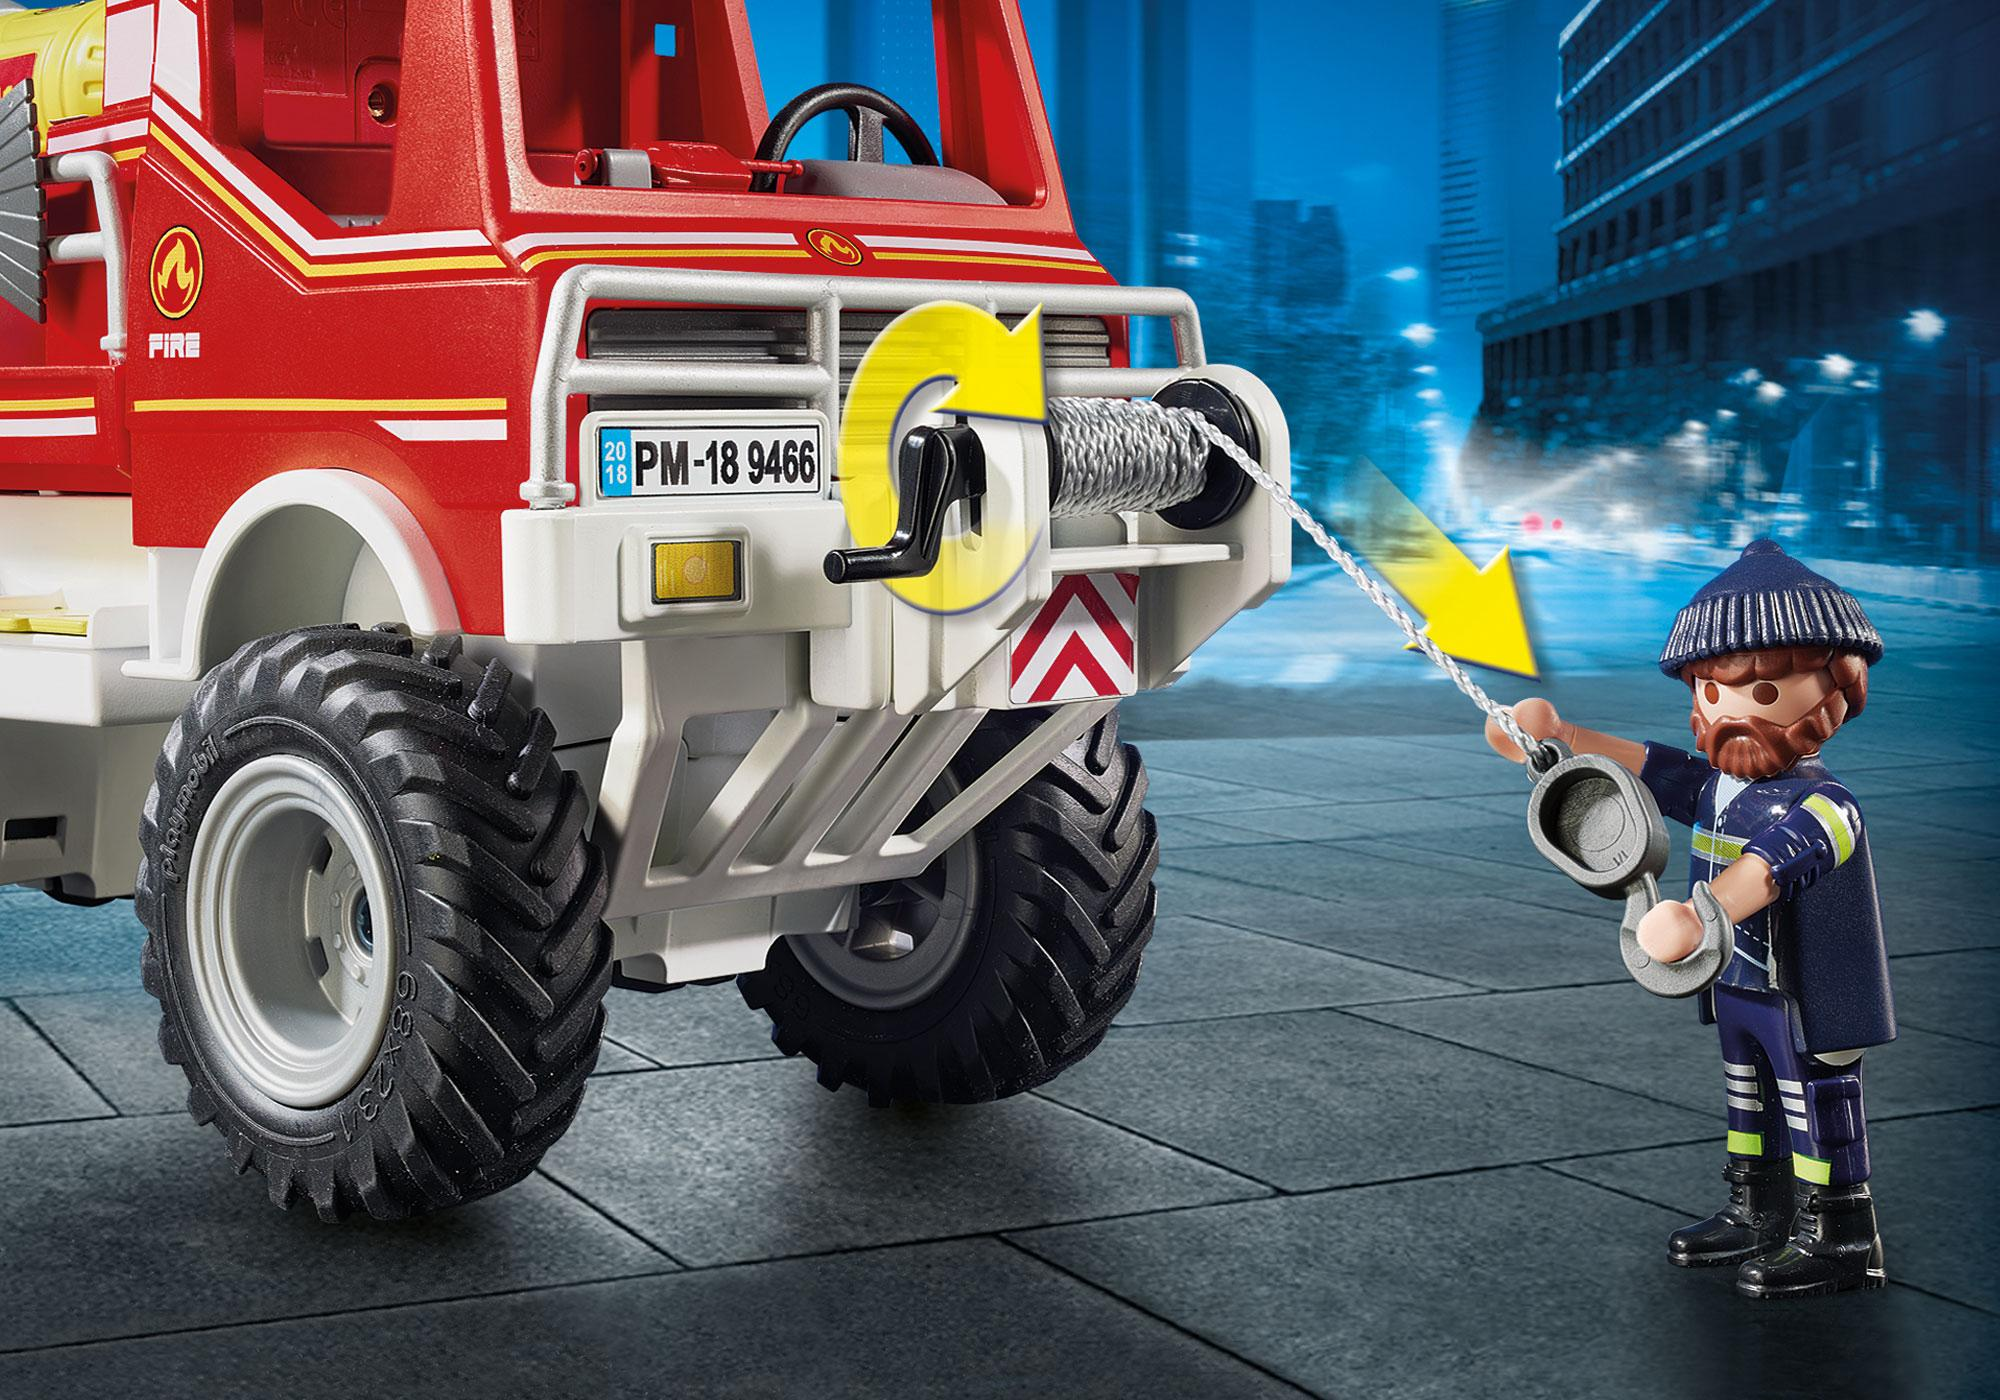 http://media.playmobil.com/i/playmobil/9466_product_extra1/Brandbil